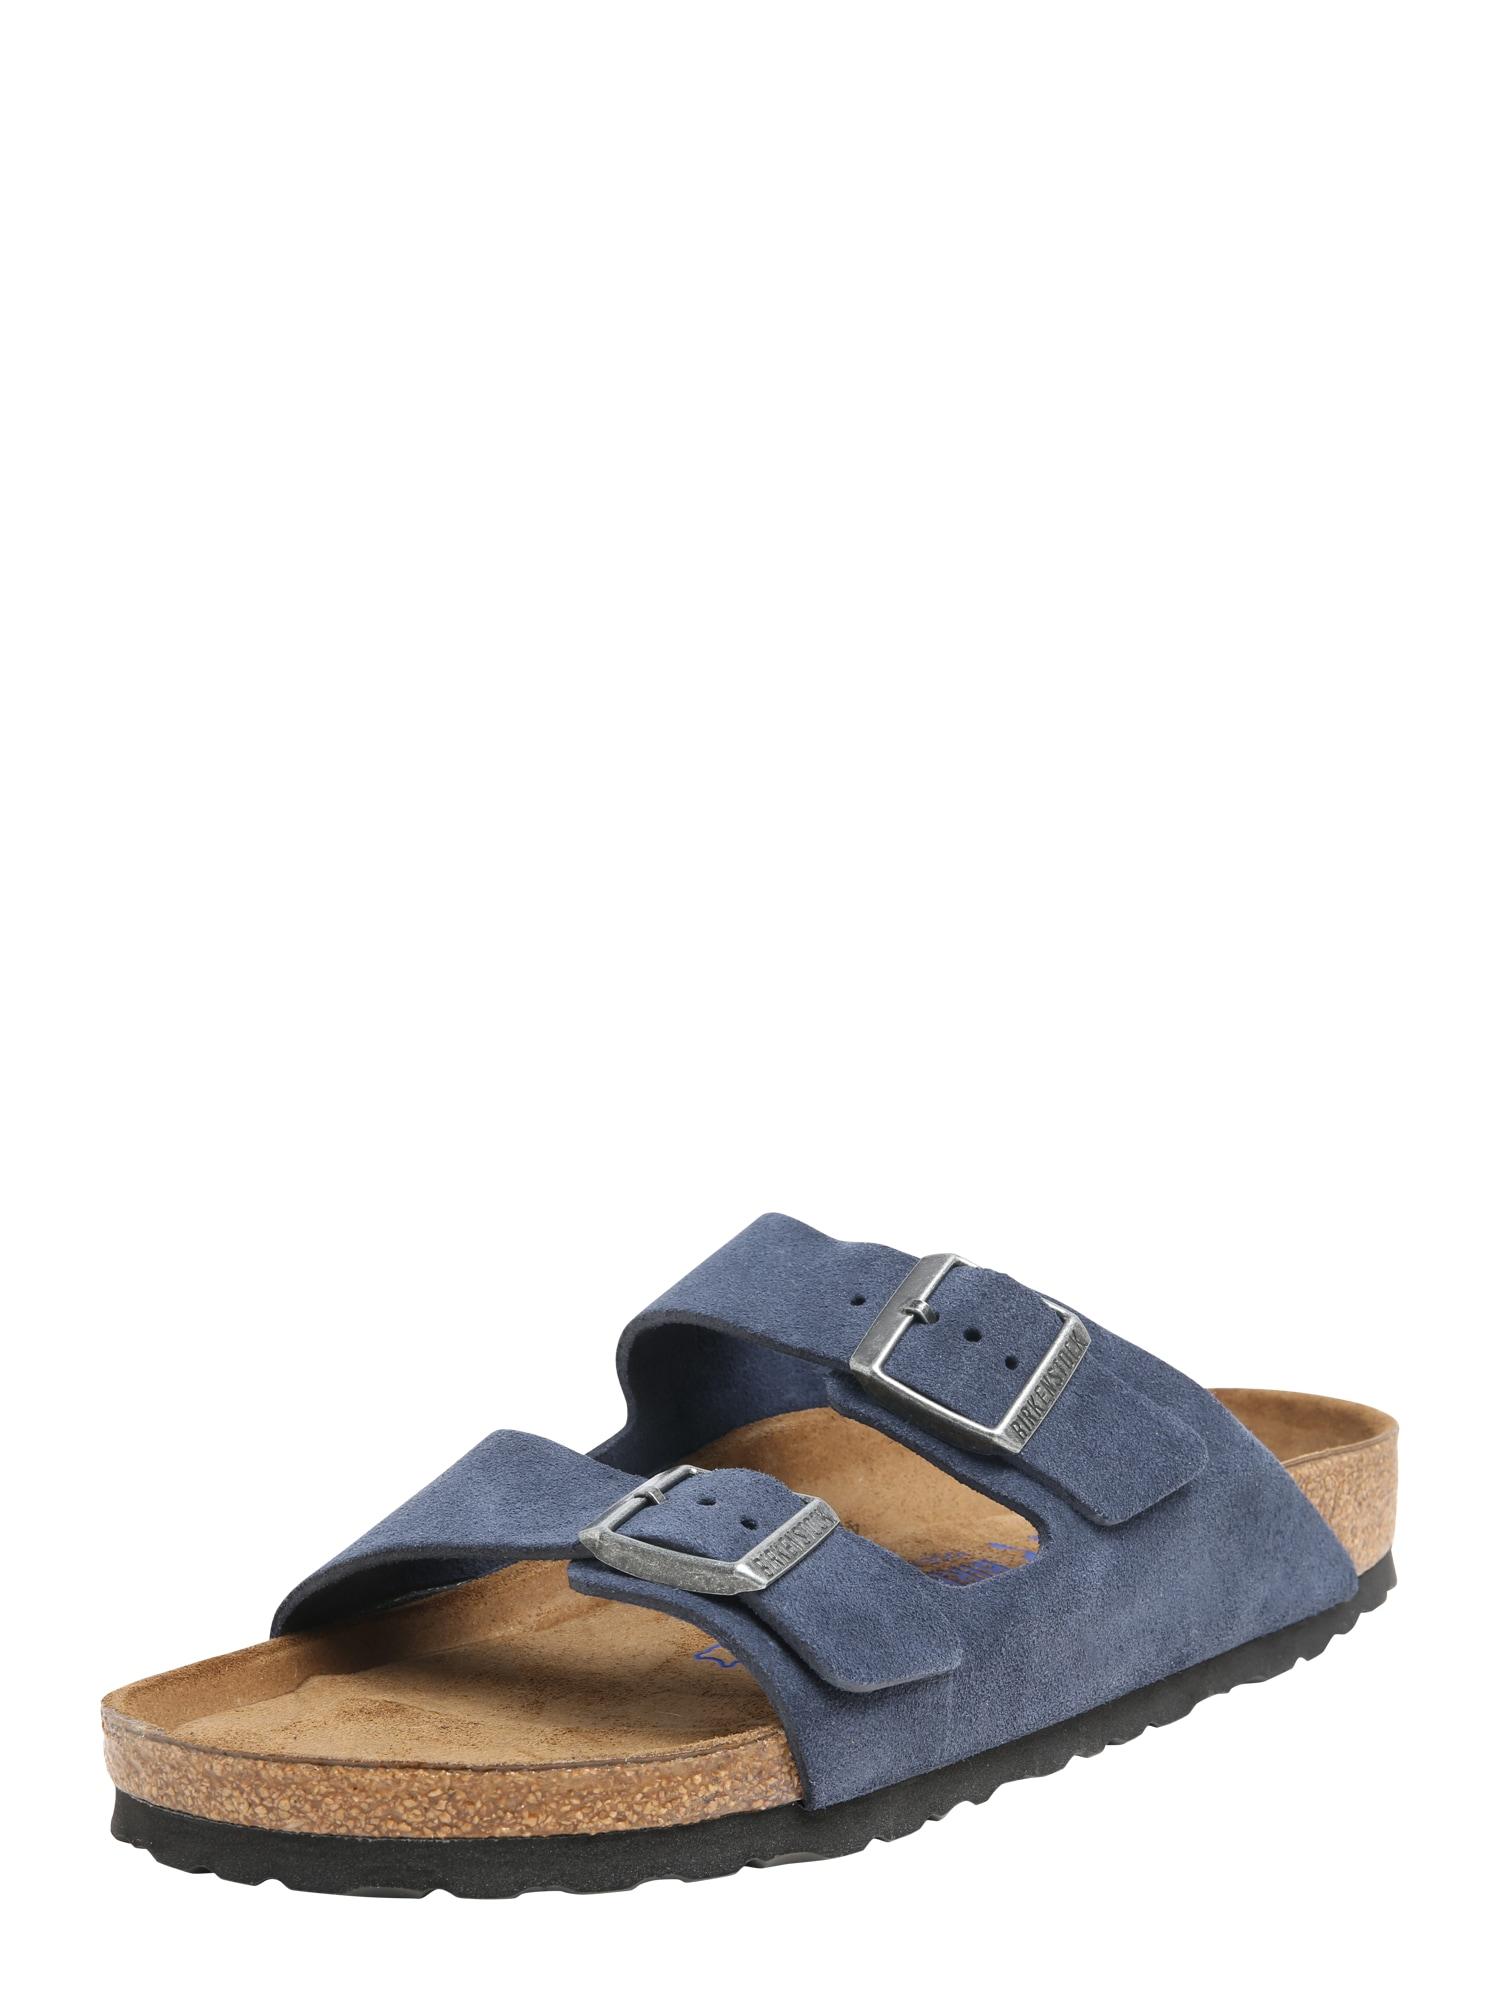 Pantofle Arizona Suede tmavě modrá BIRKENSTOCK